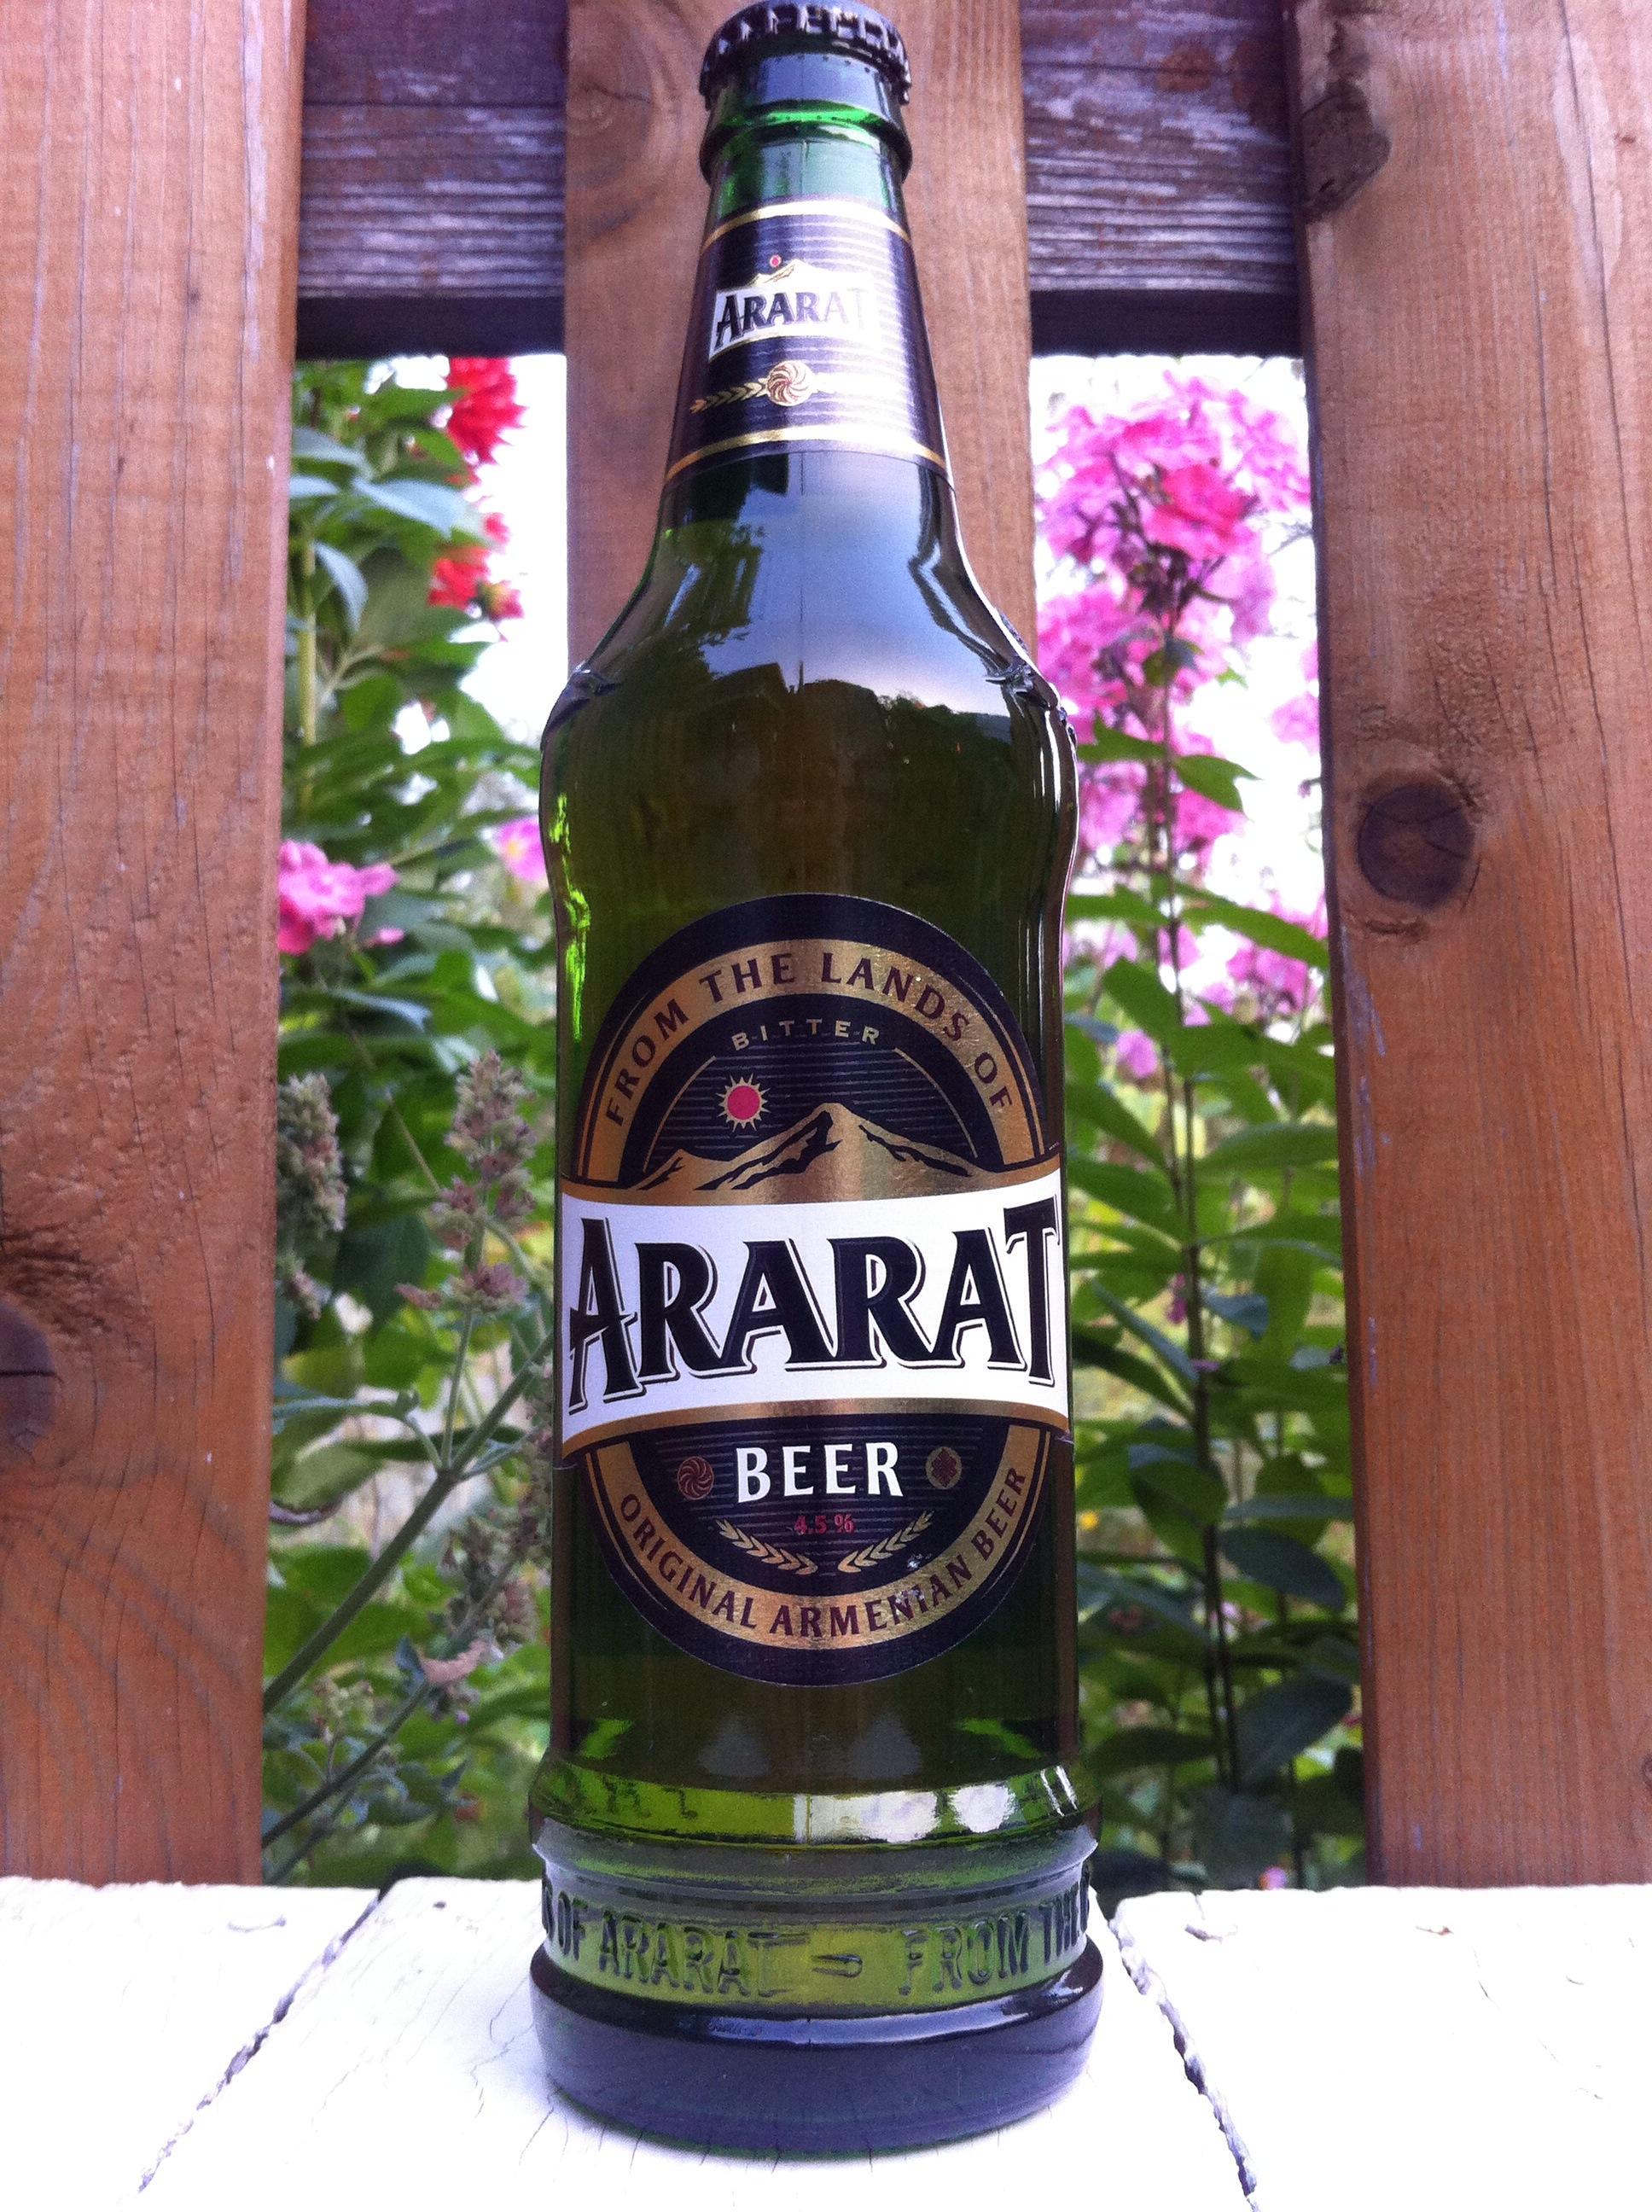 Ararat Bitter Арарат Биттер (Армения)